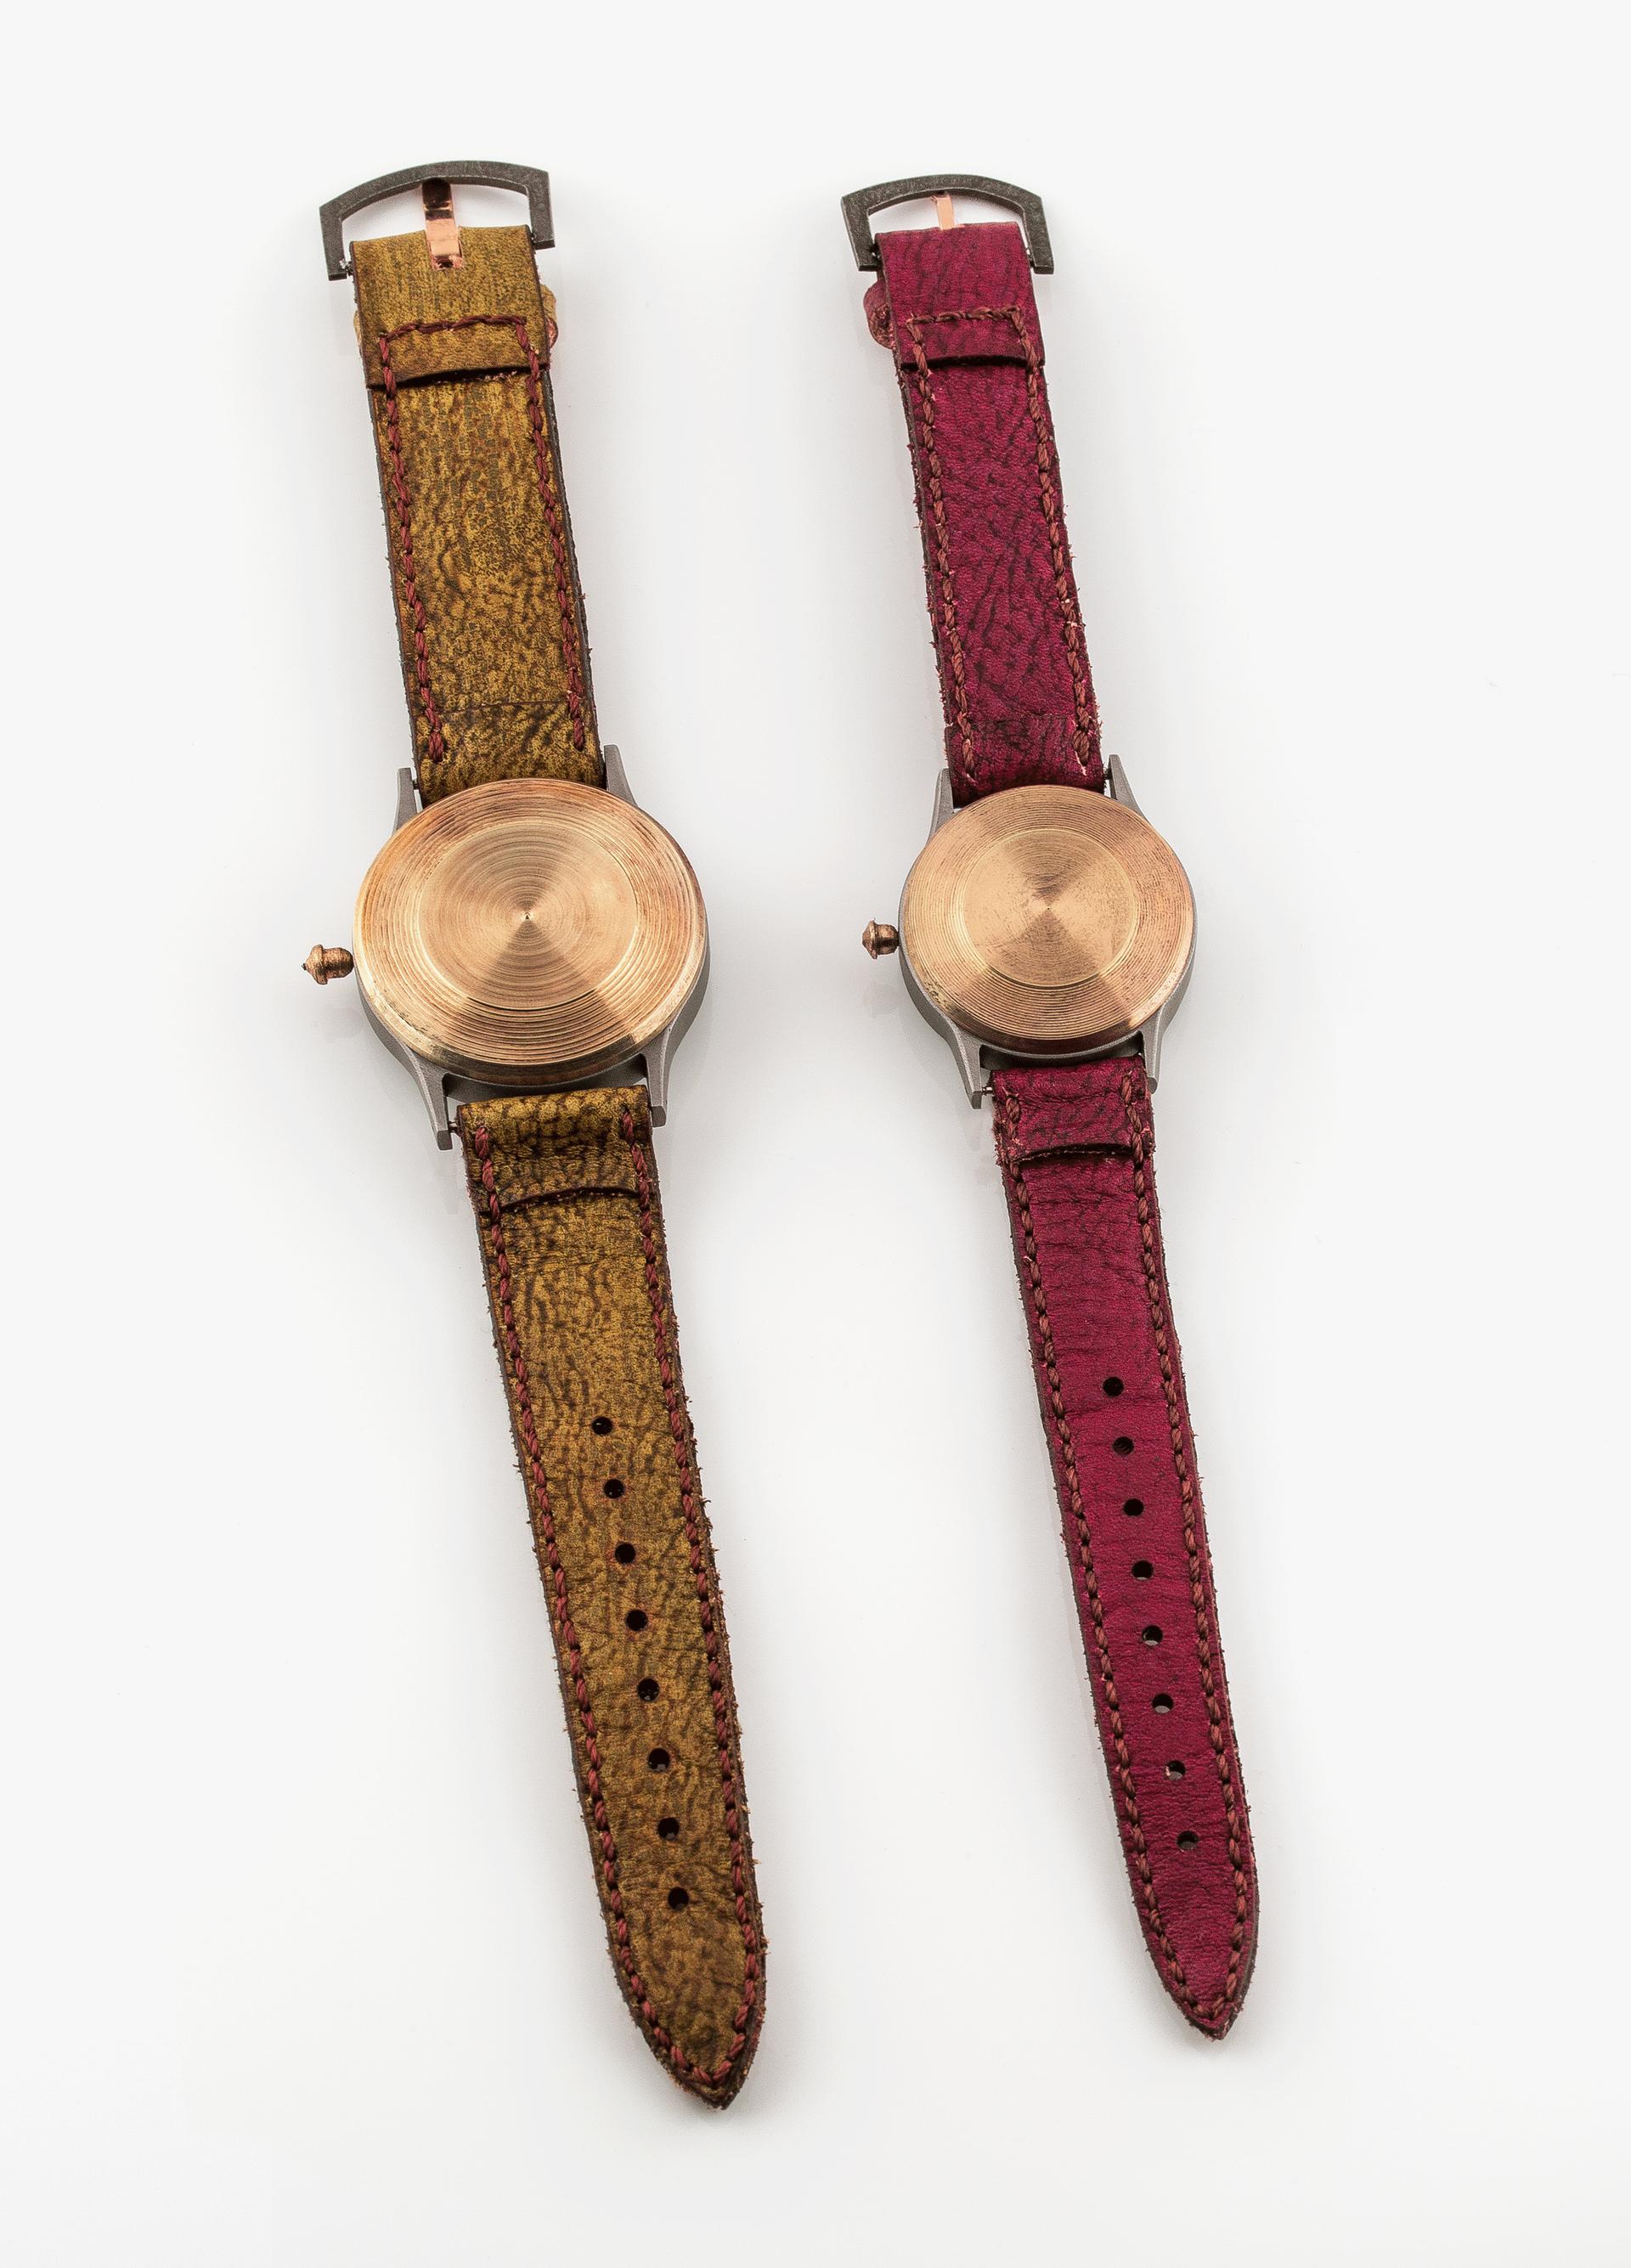 talahi-watches-1.png